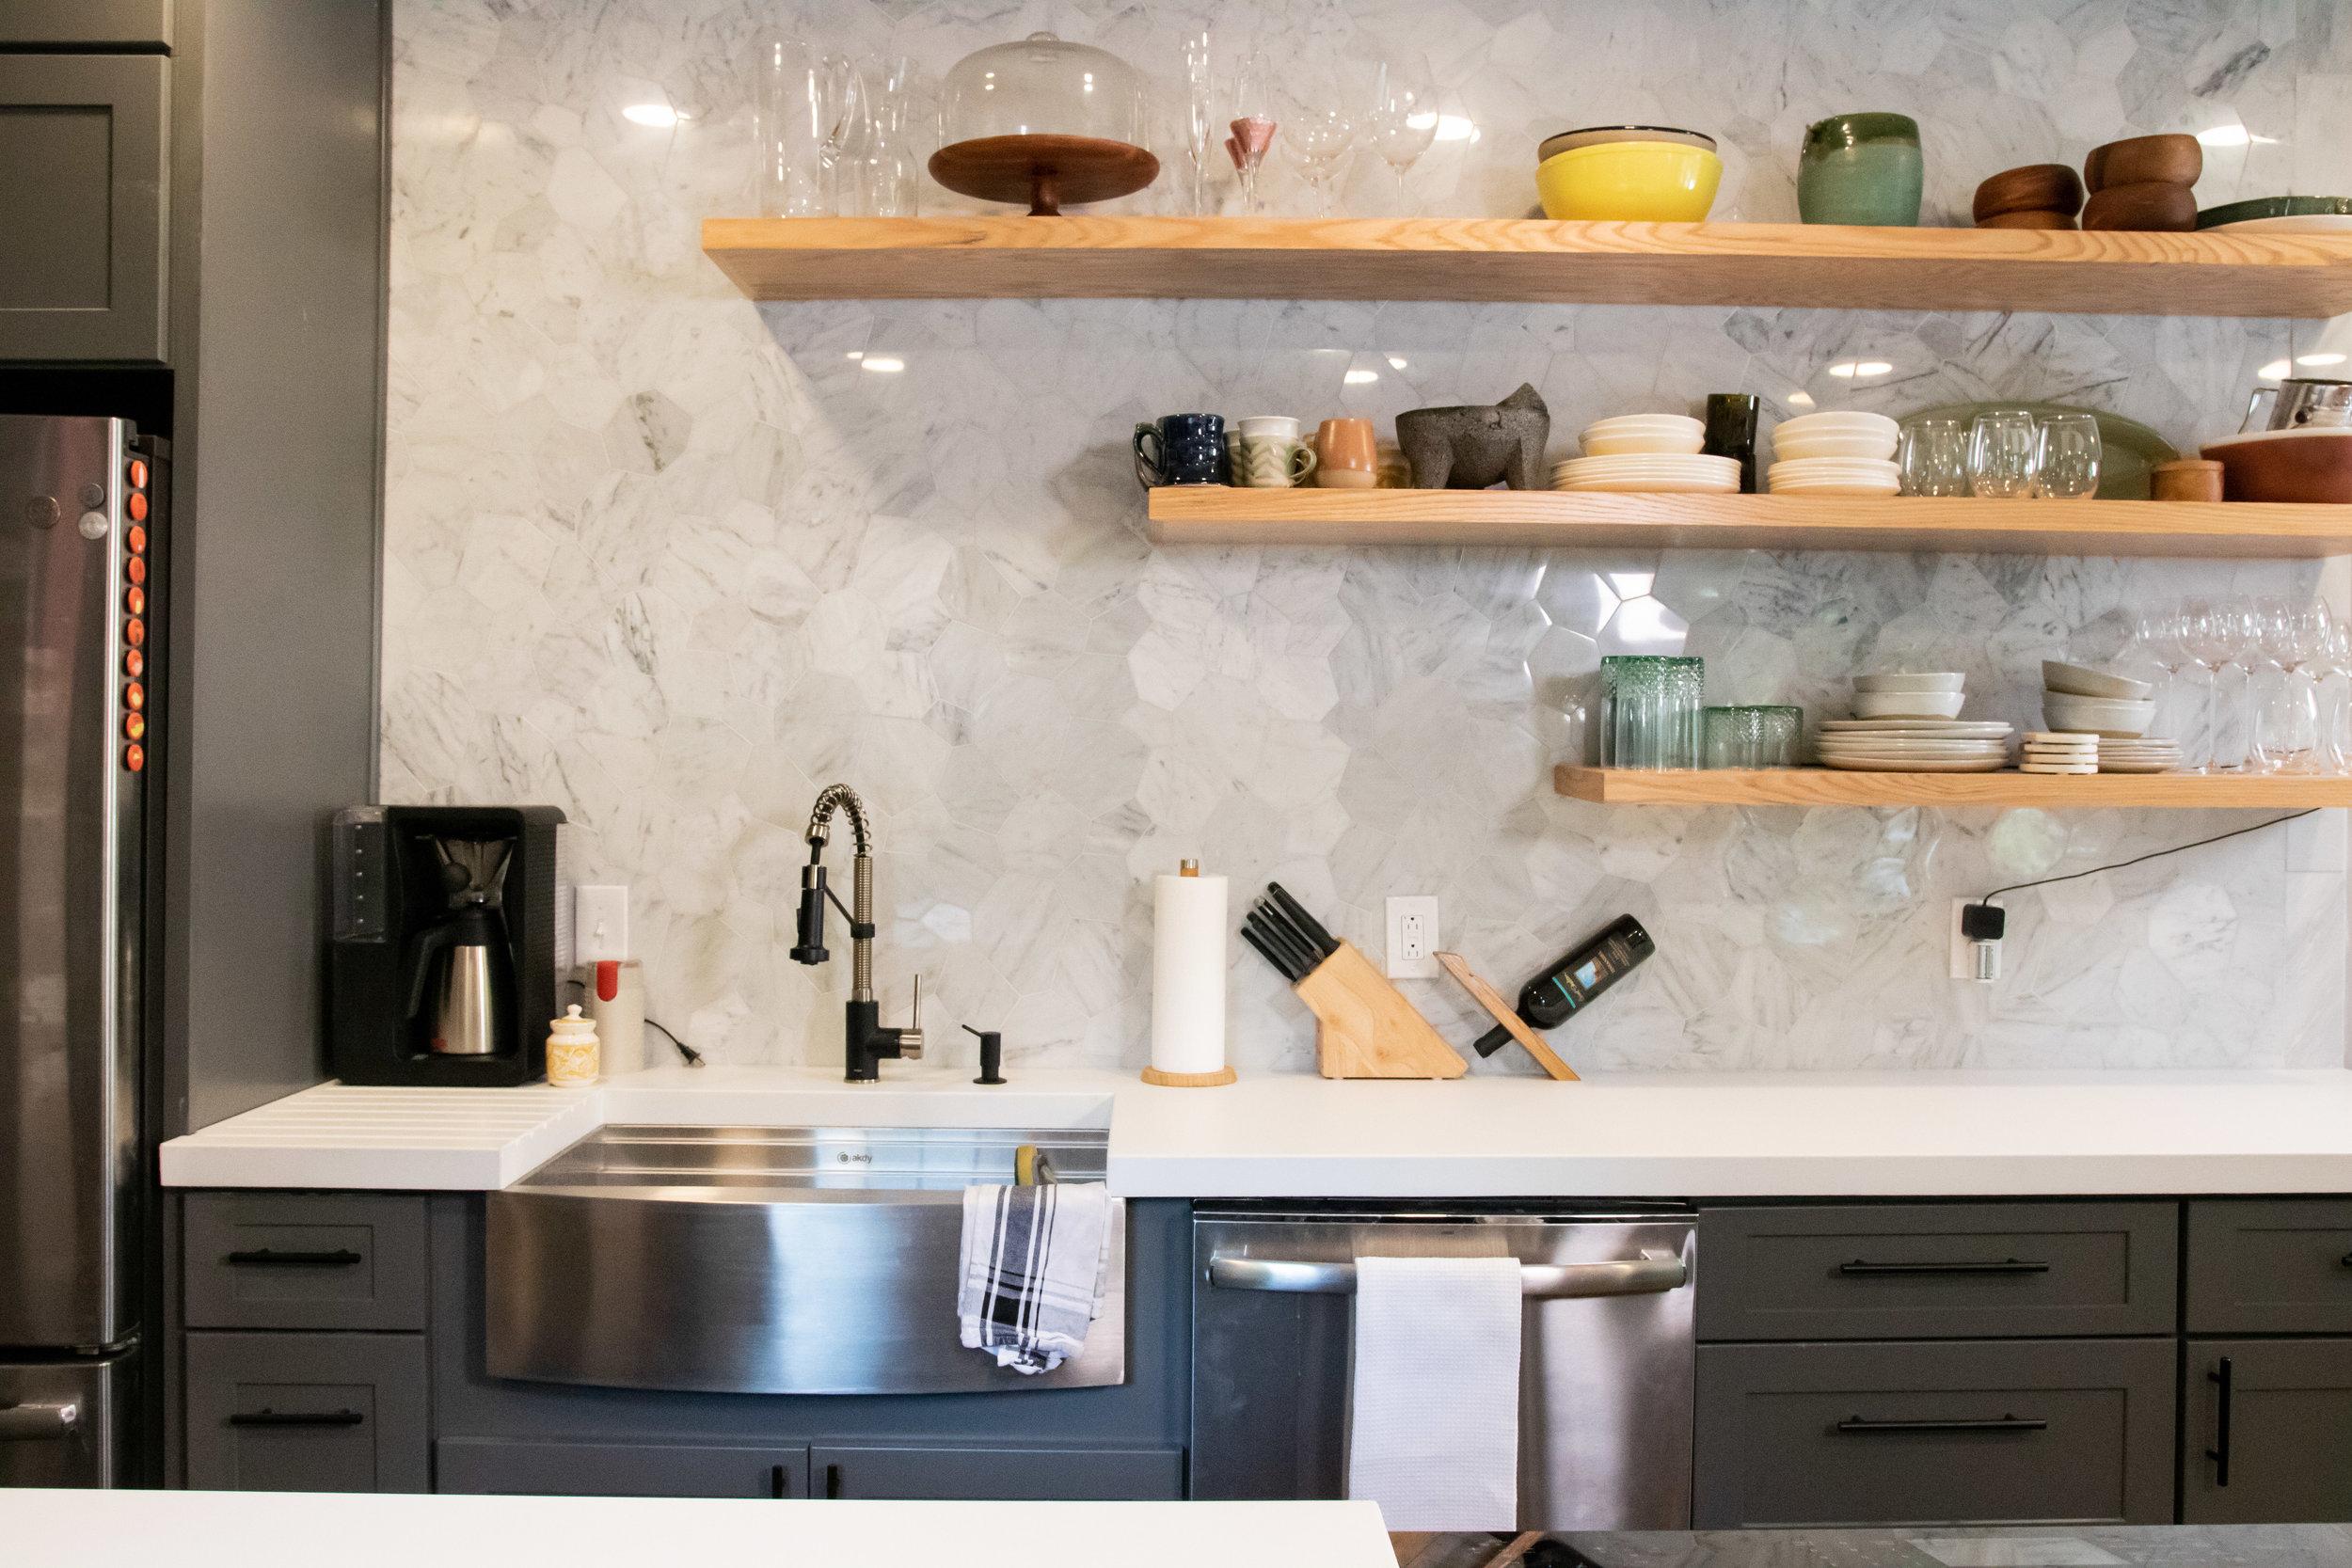 5300-countertop-kitchen-5.jpg